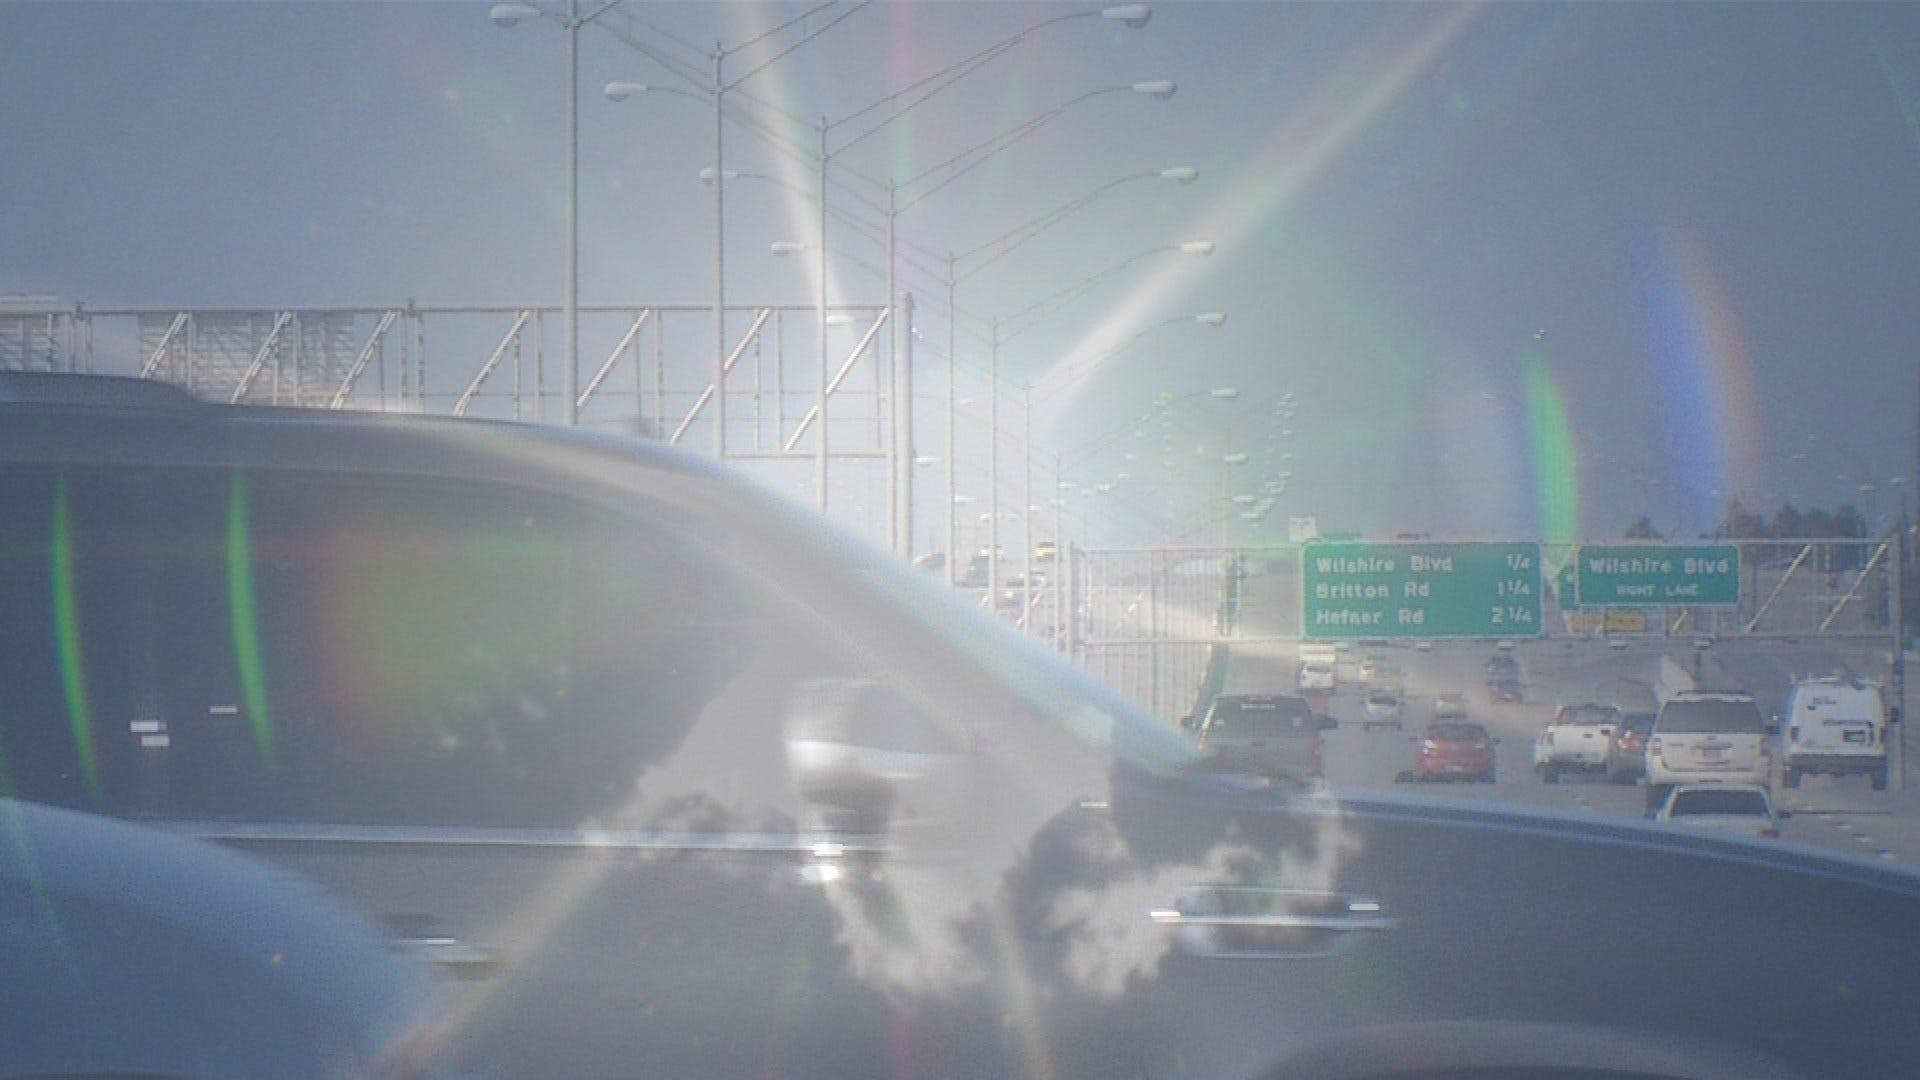 Relentless Heat Affects Vehicles, Too